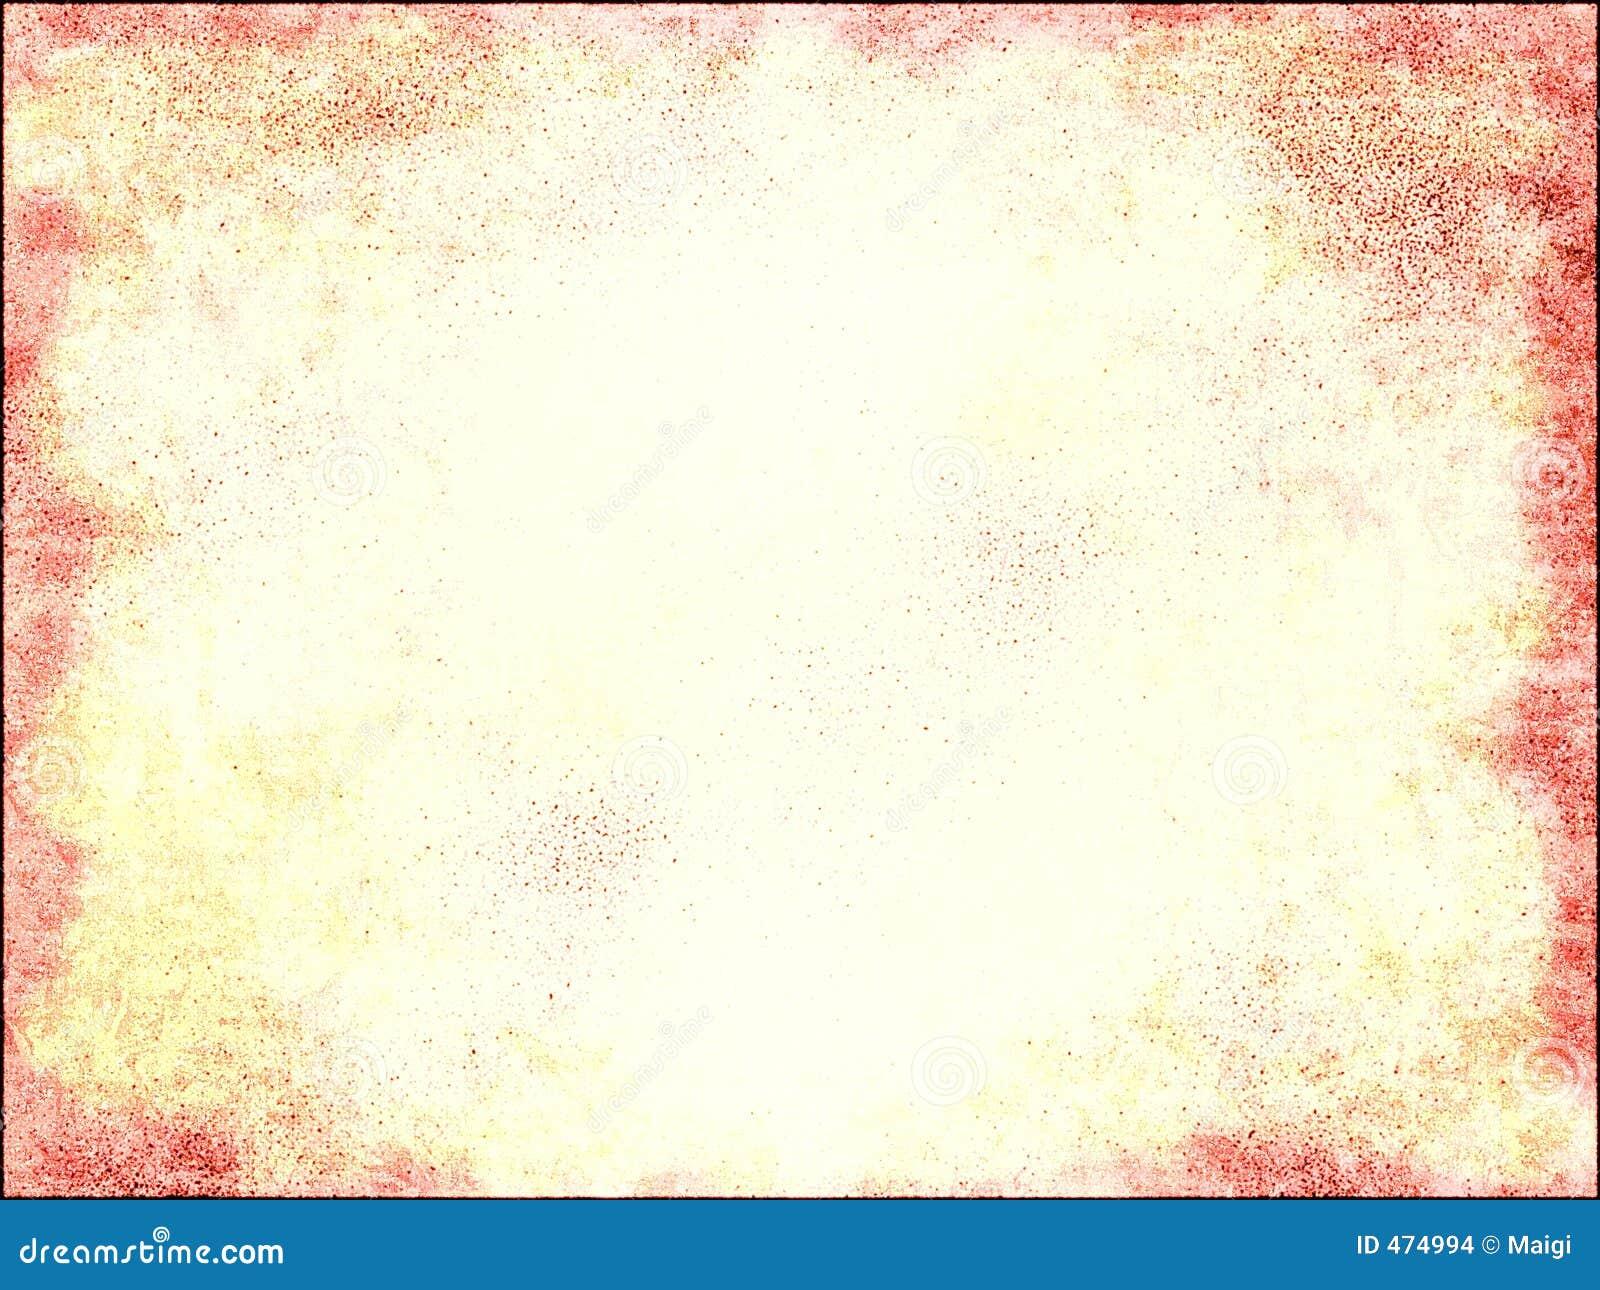 Download Retro paper background stock illustration. Illustration of blank - 474994